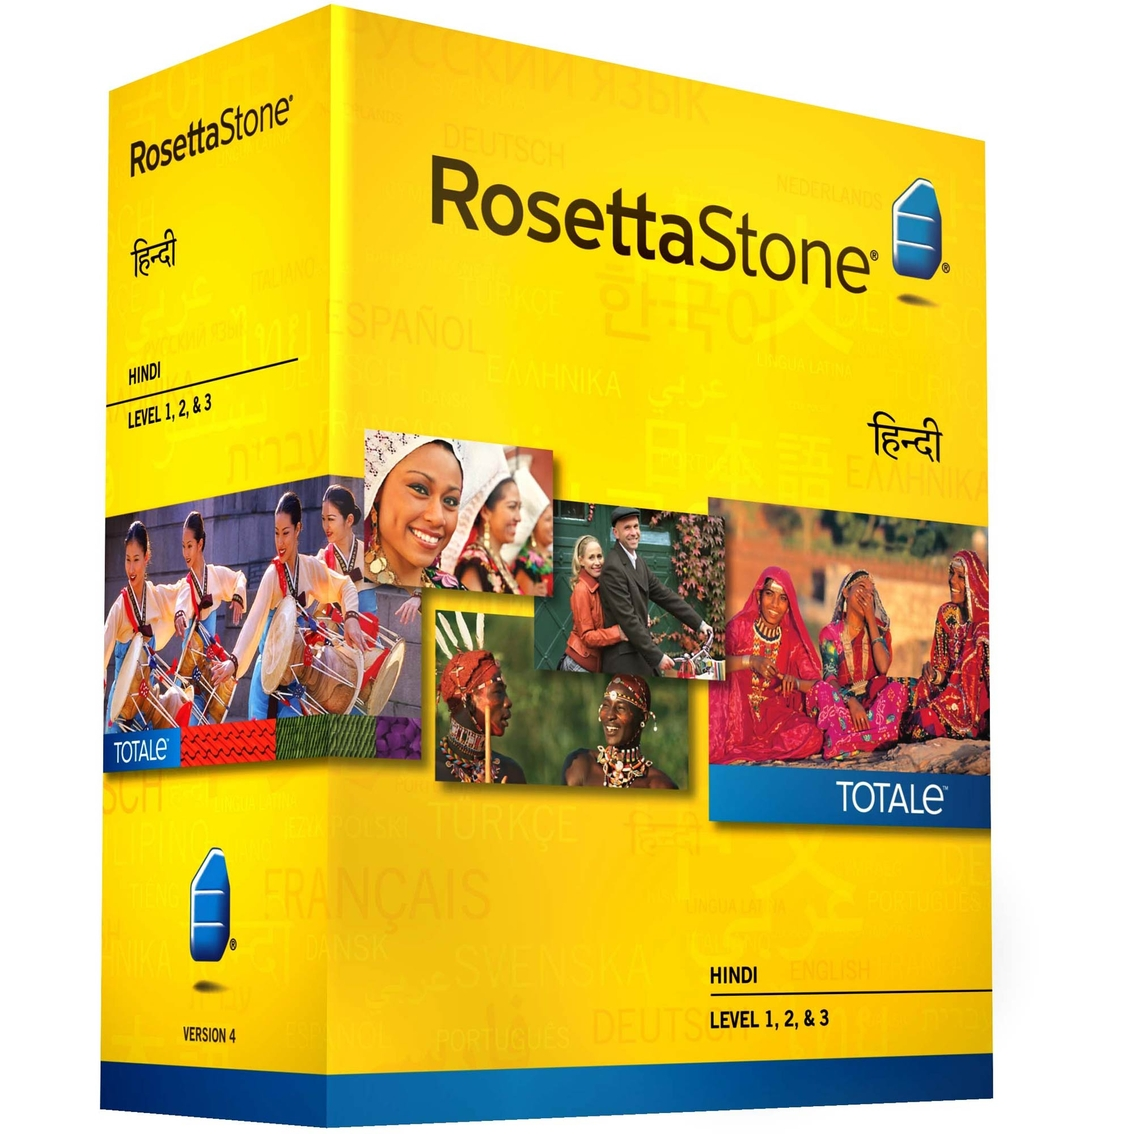 Rosetta Stone Version 4 Totale: Hindi Levels 1-3   Language Software